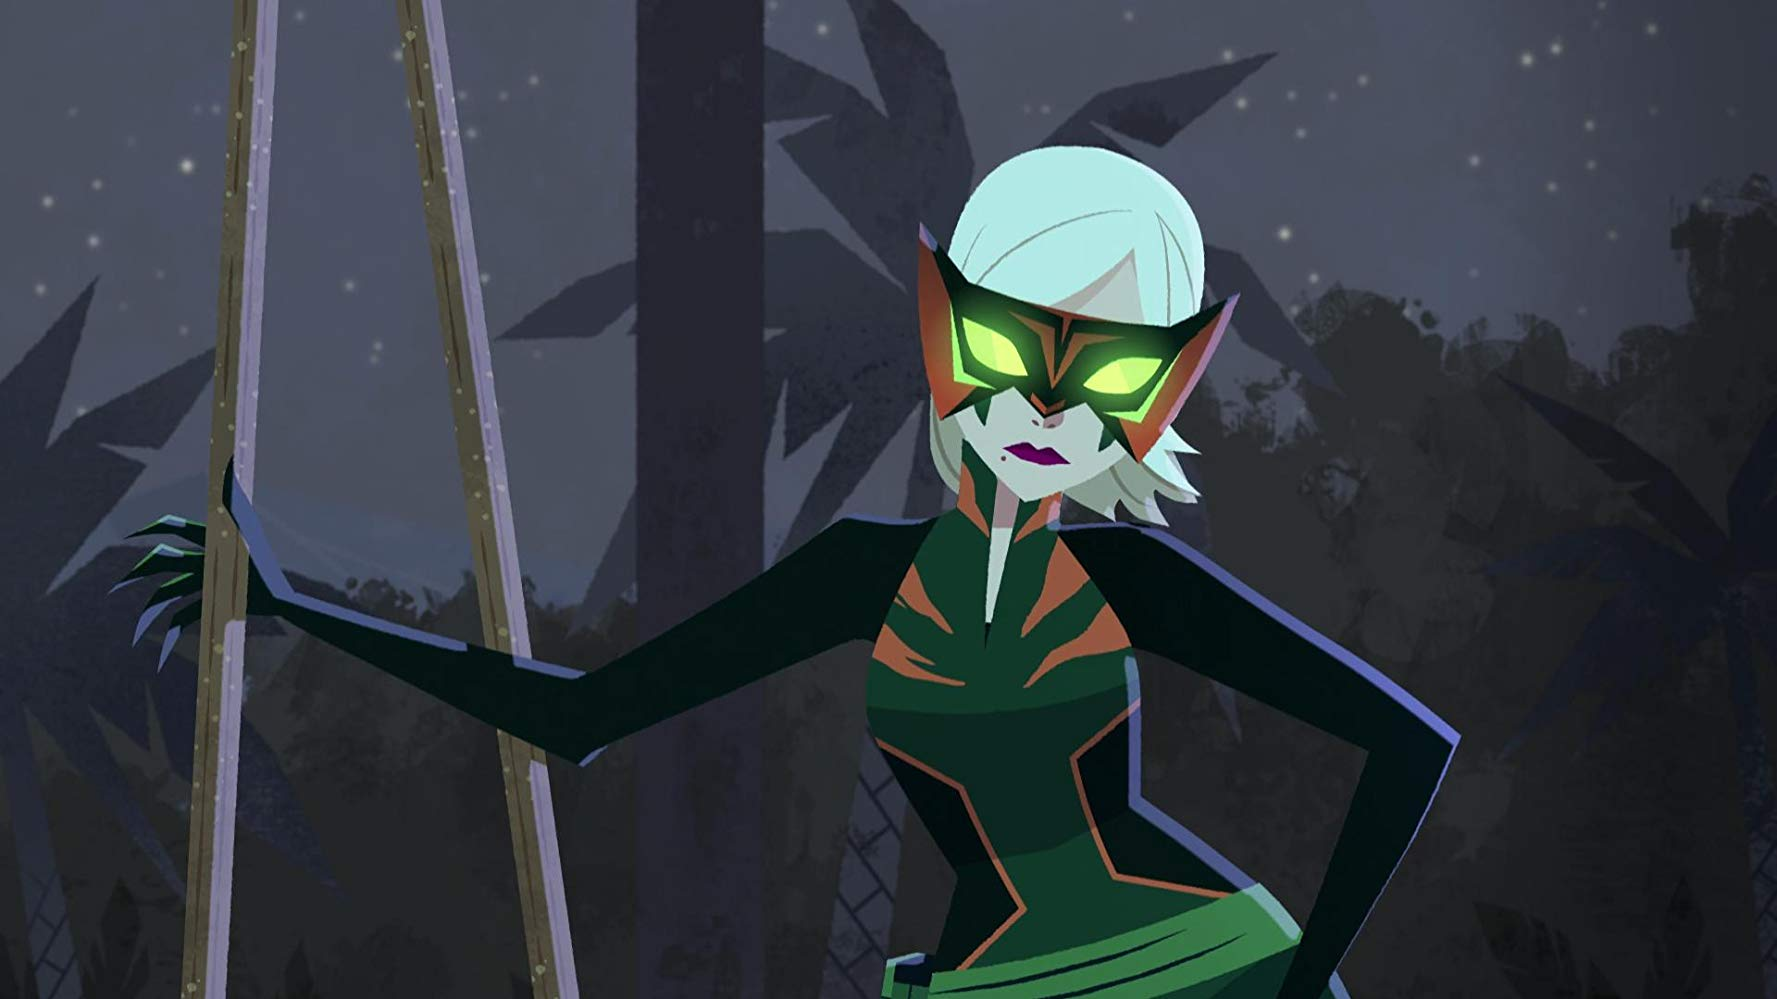 Tigress (Carmen Sandiego)